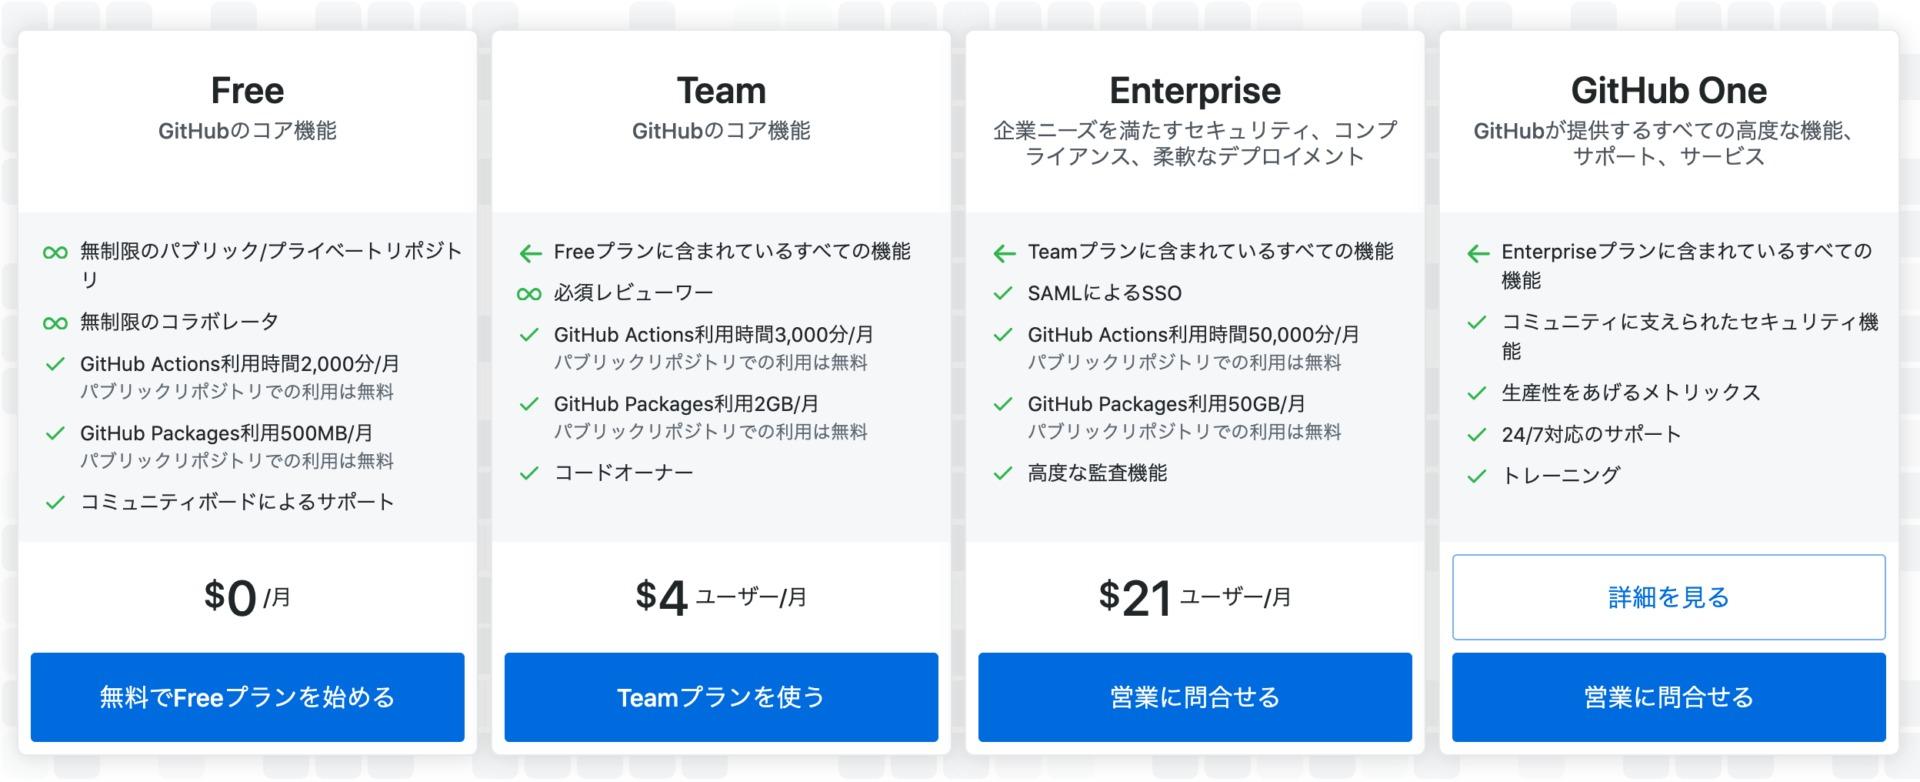 GitHubの料金表